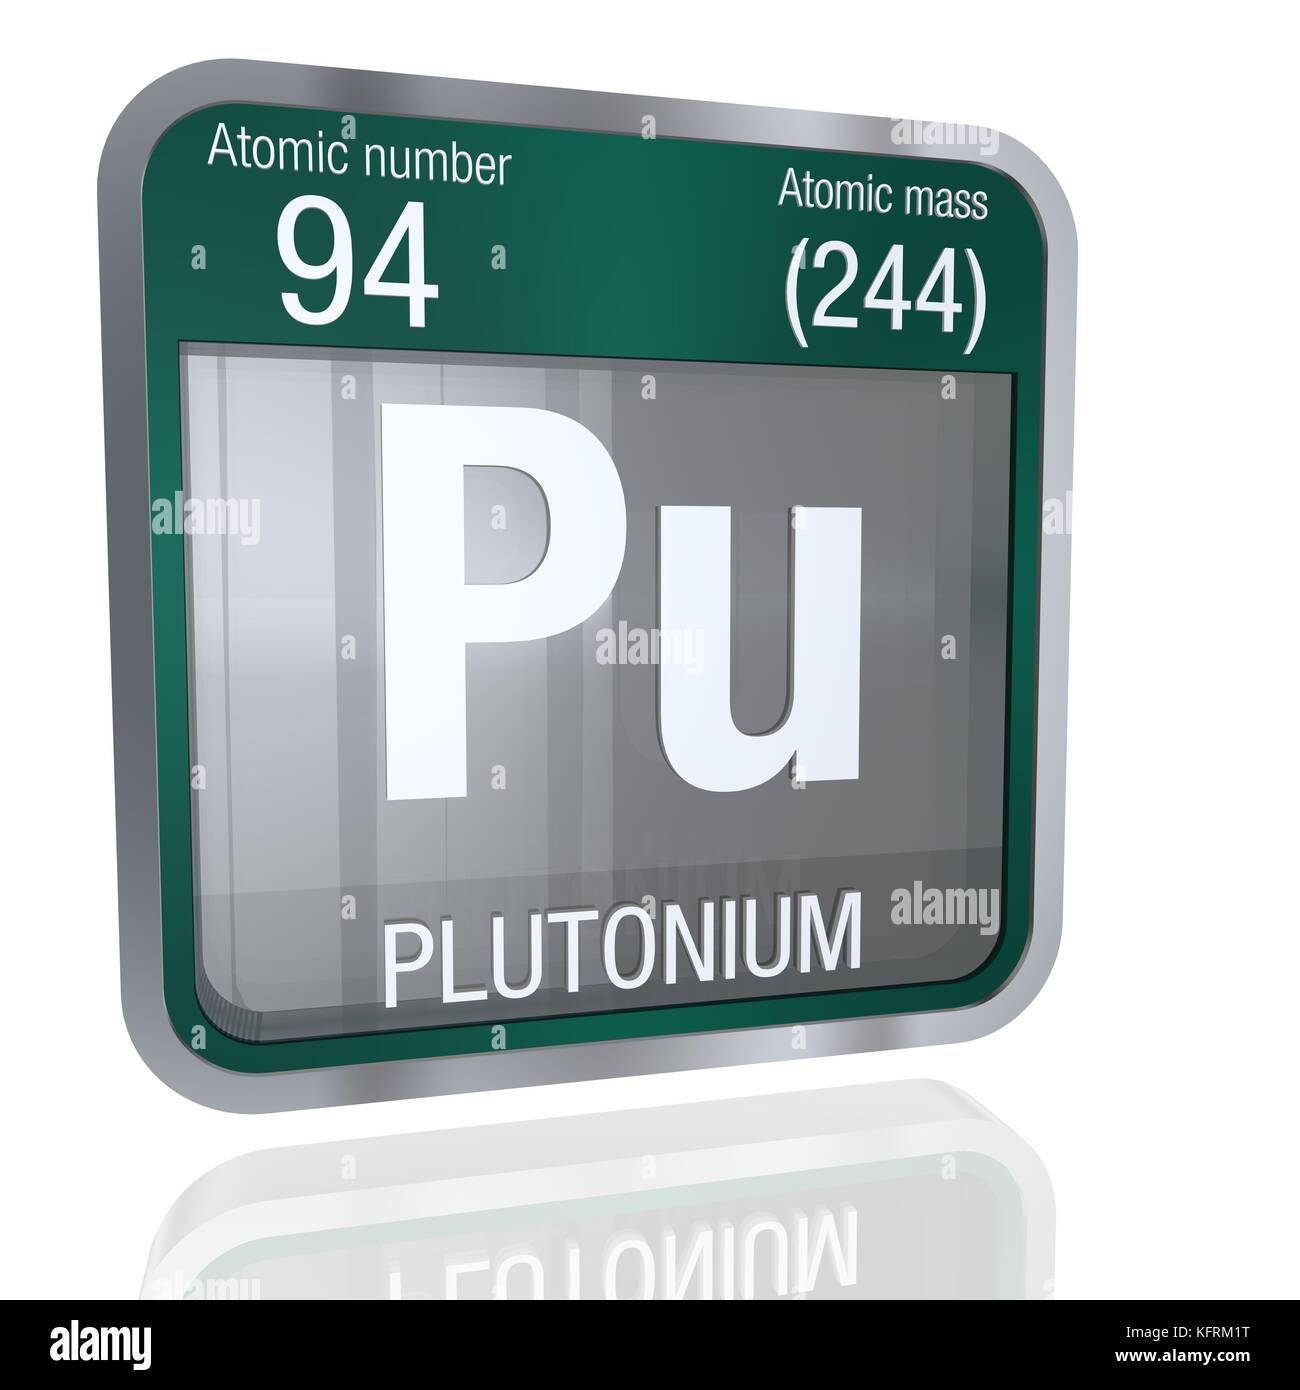 Plutonium Symbol In Square Shape With Metallic Border And Stock